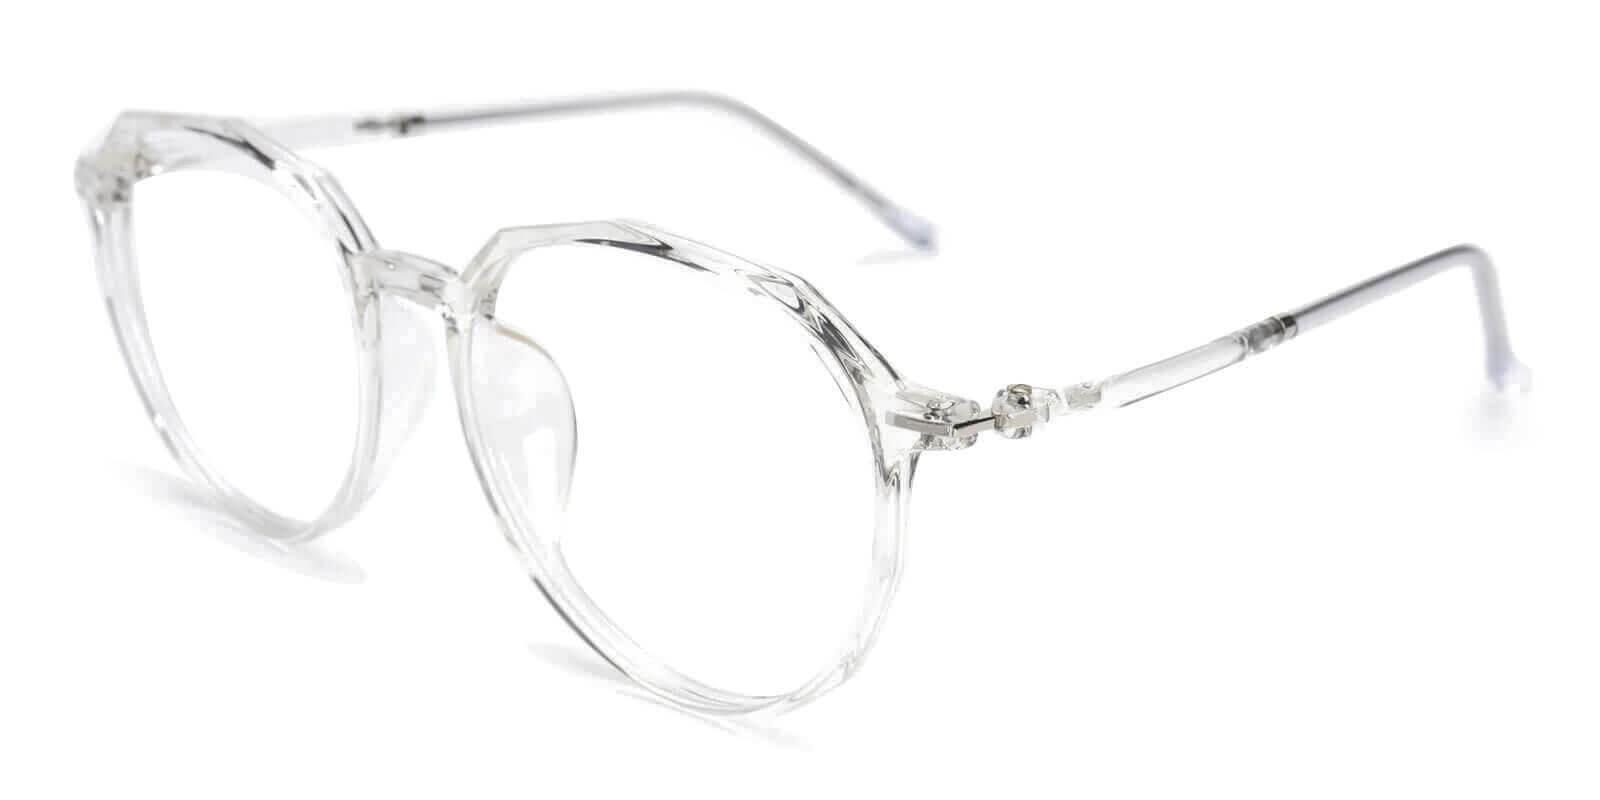 Ruby Translucent TR Lightweight , UniversalBridgeFit , Eyeglasses Frames from ABBE Glasses